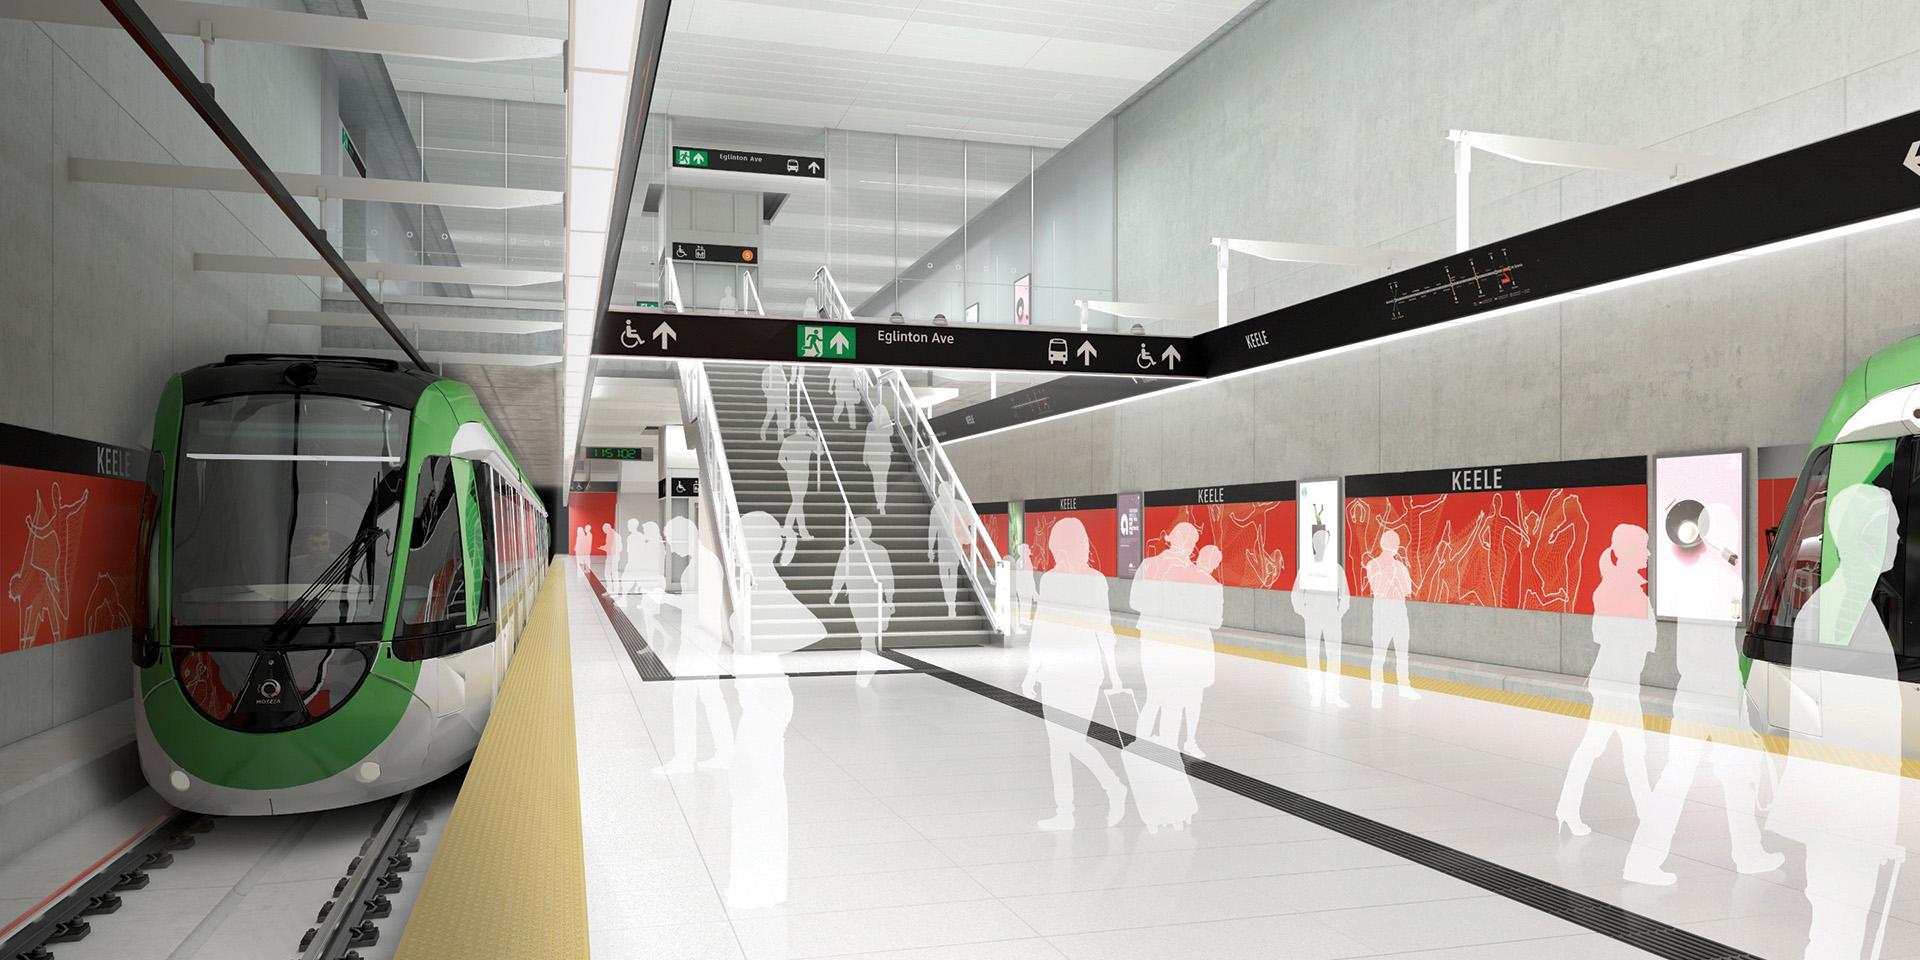 Keele Interior Platform Rendering